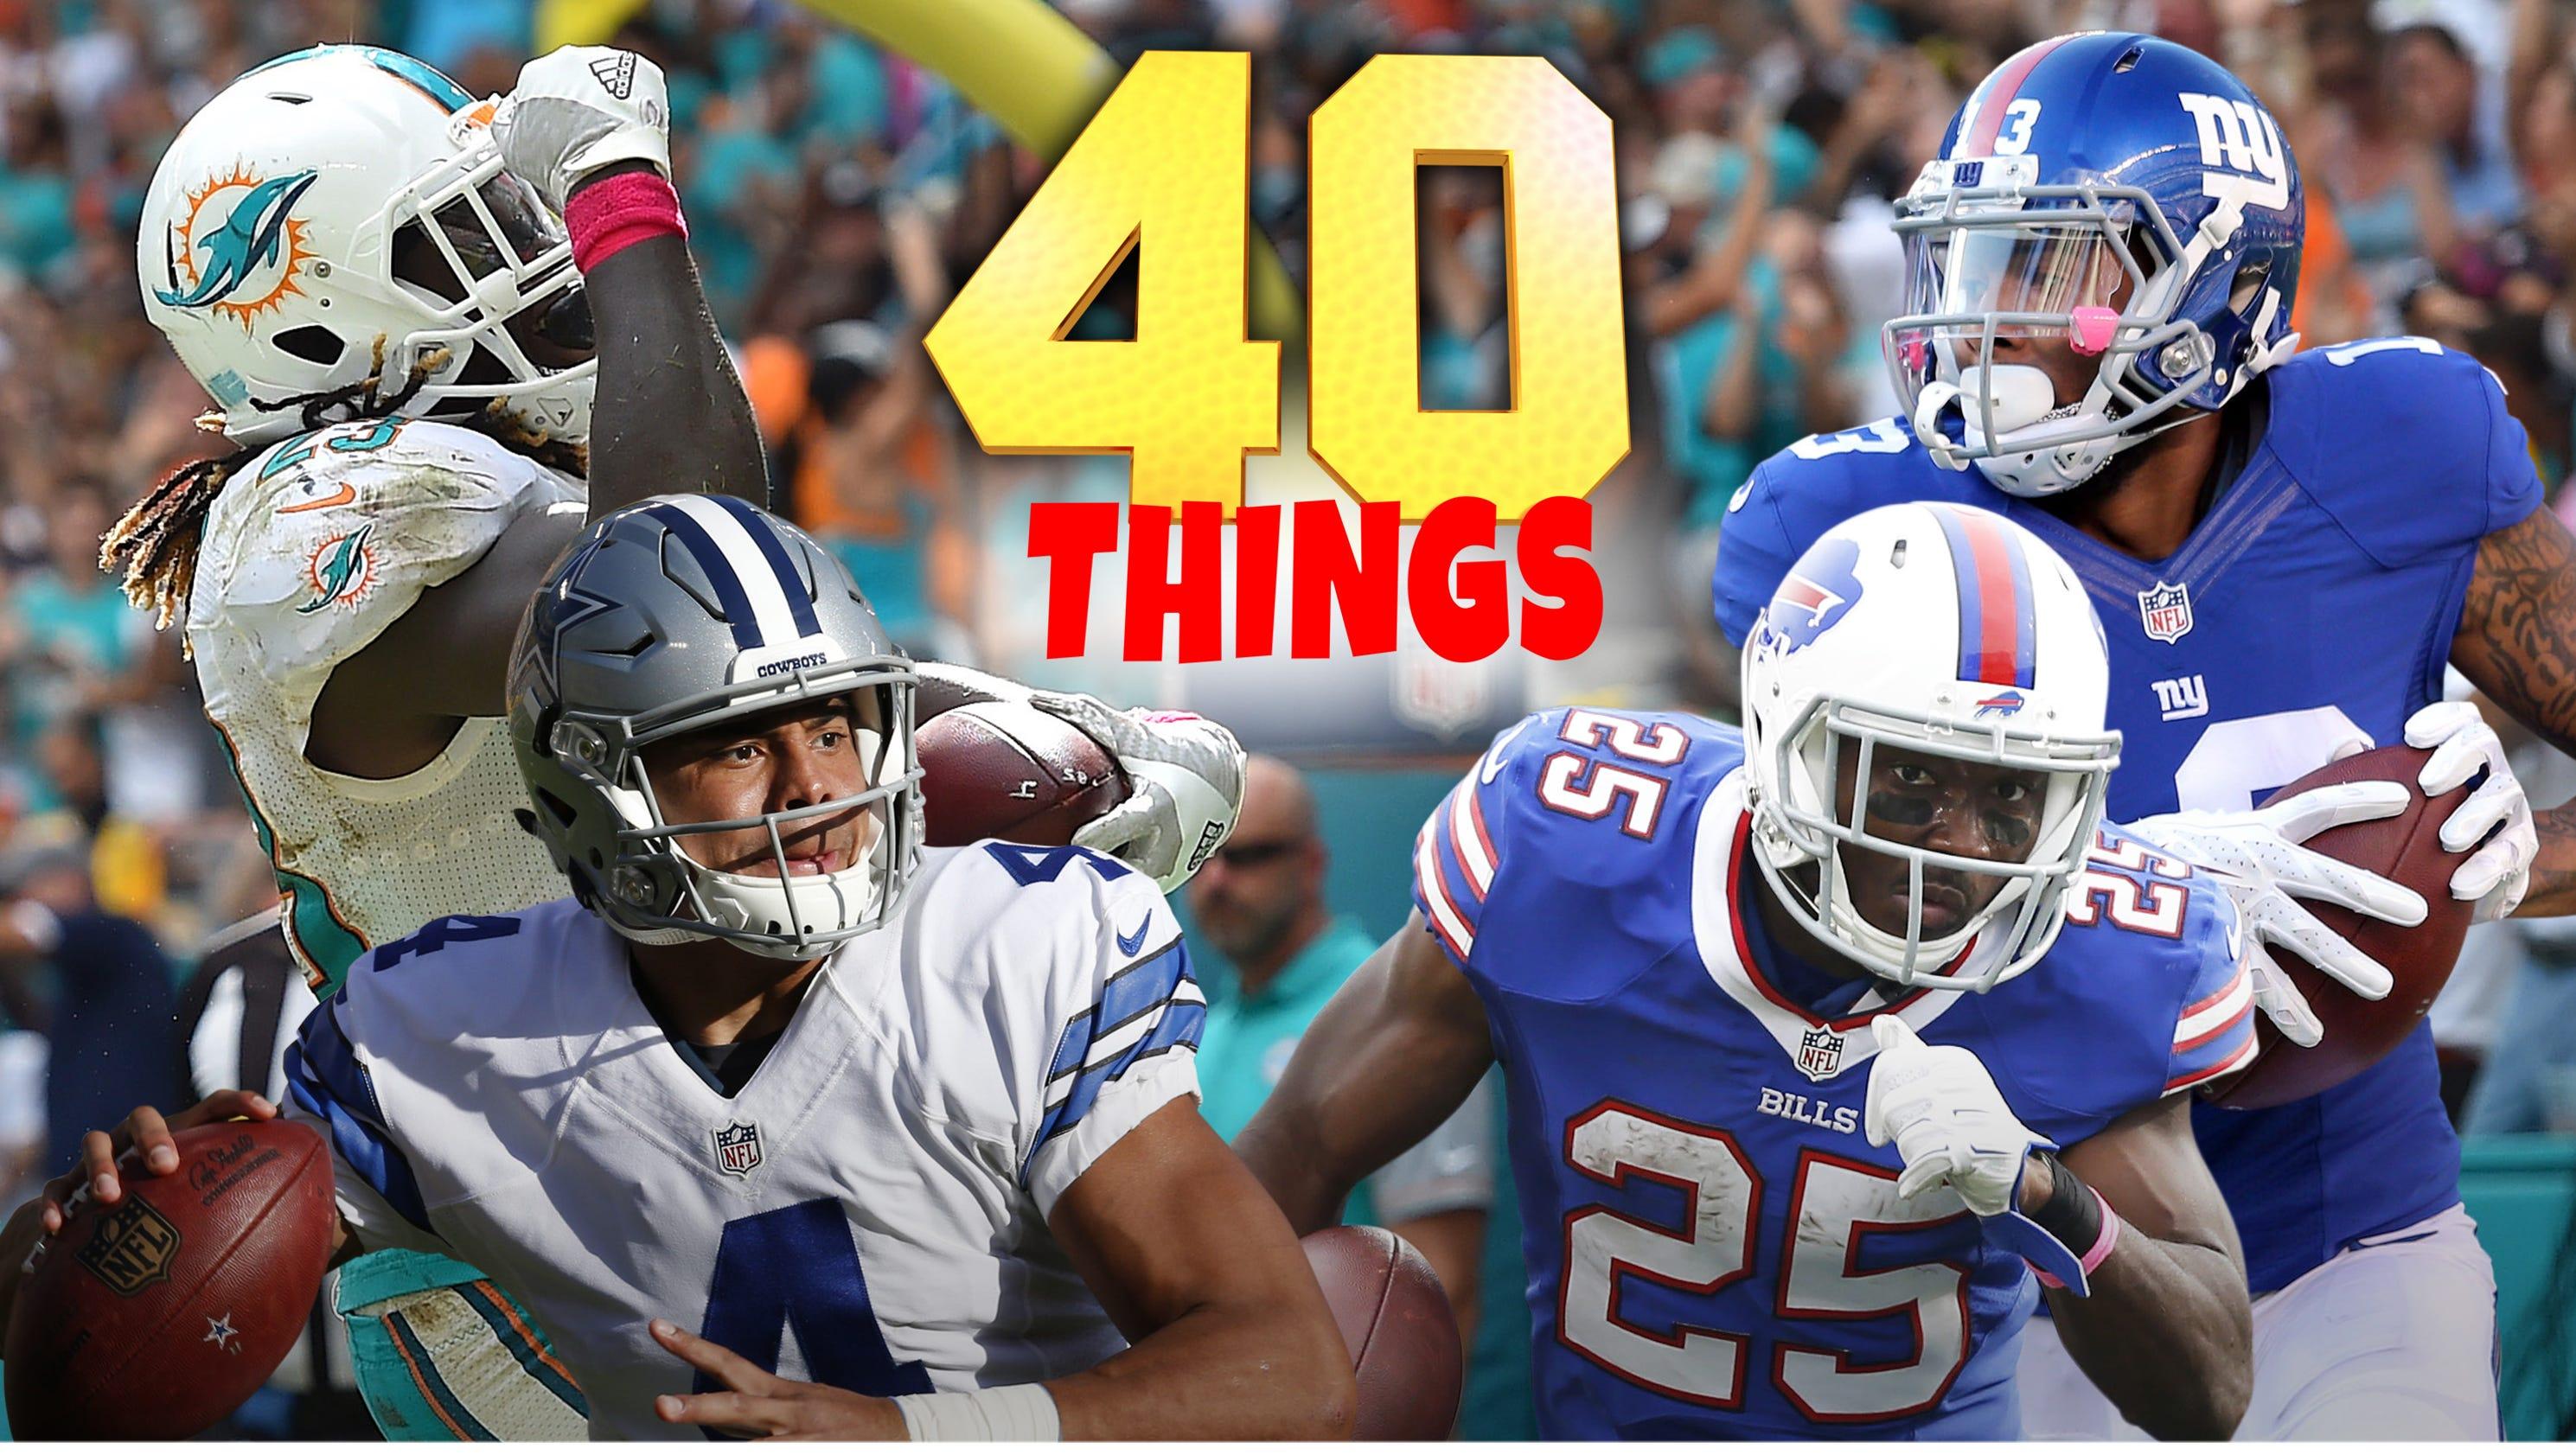 10 Things We Learned At The 2016: 40 Things We Learned In Week 6 Of The 2016 NFL Season